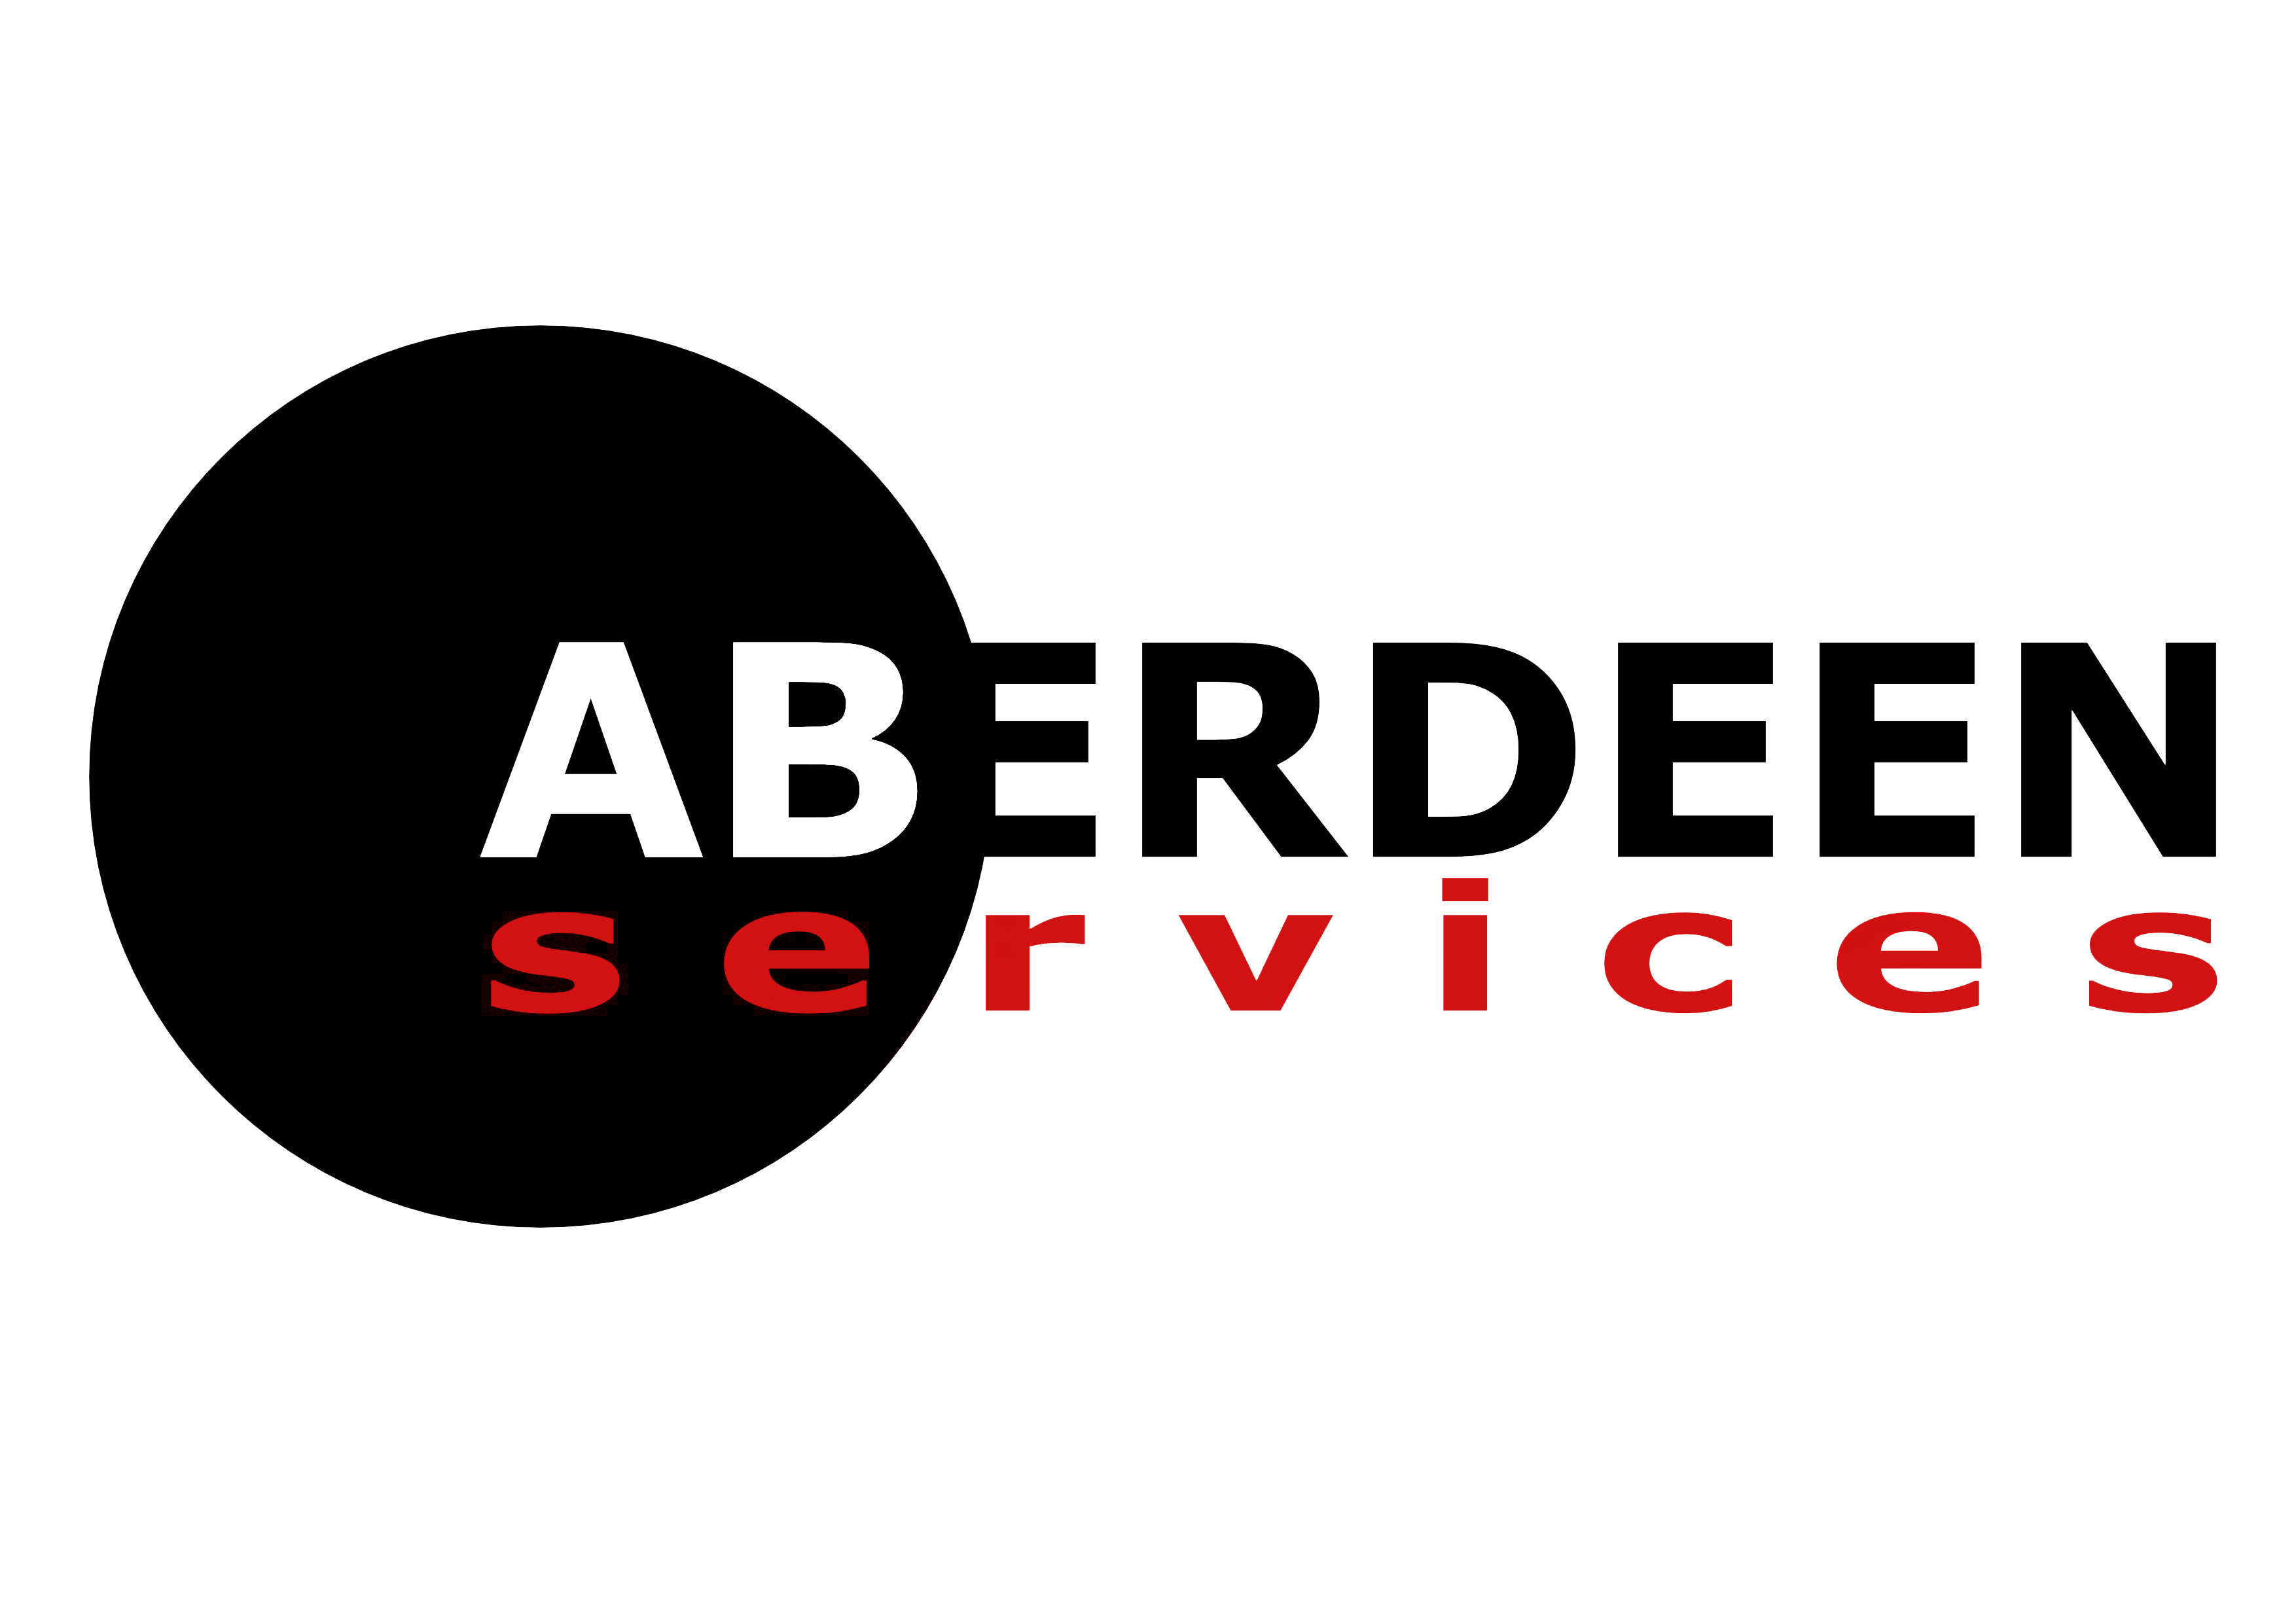 Aberdeen services